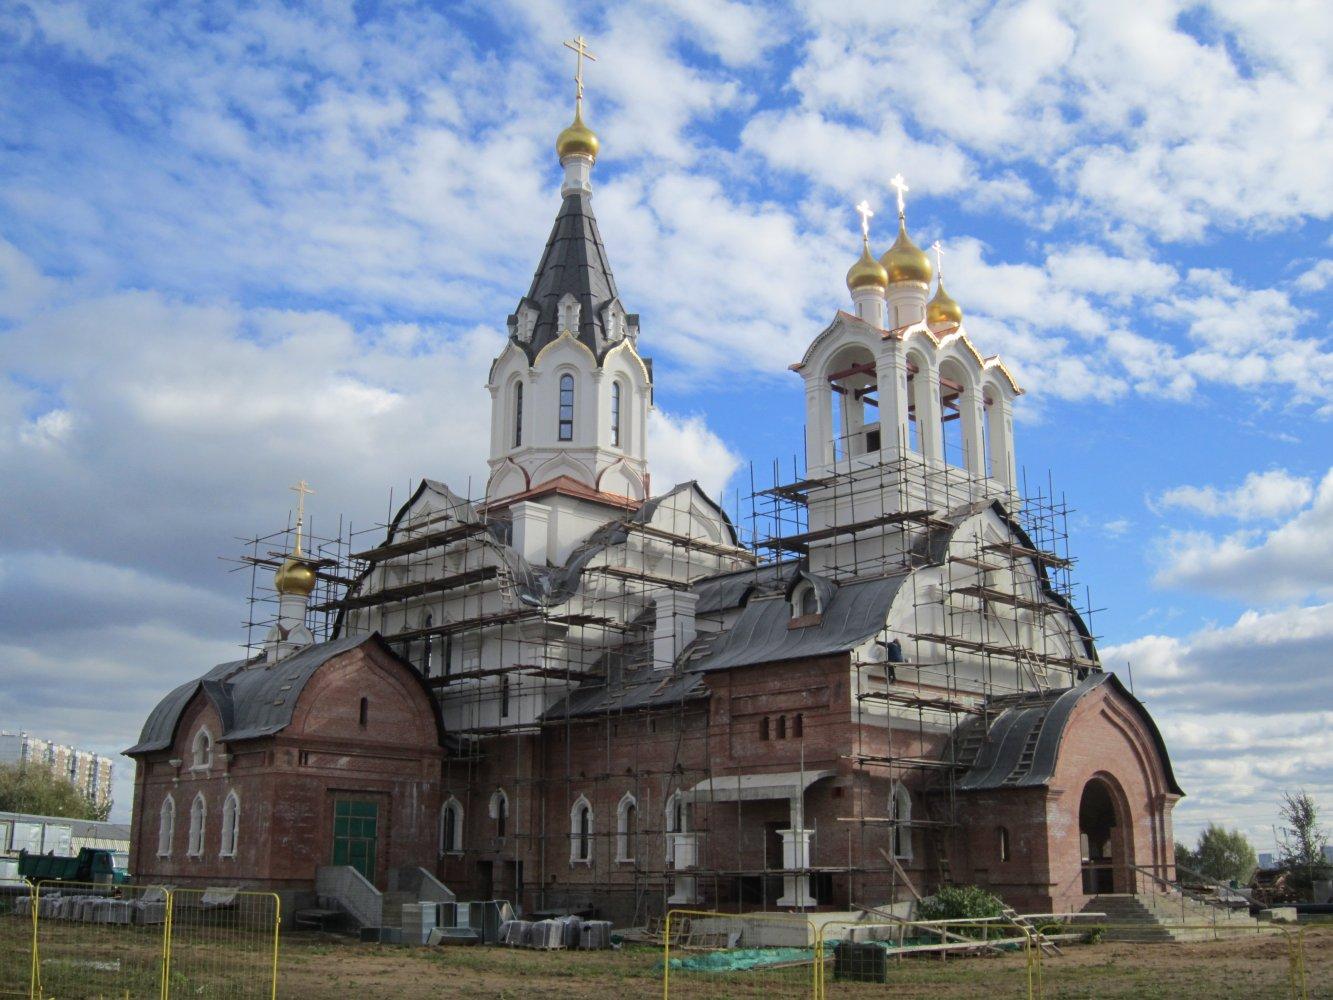 Фото IMG_9821.JPG. Россия, город Москва, улица Барышиха